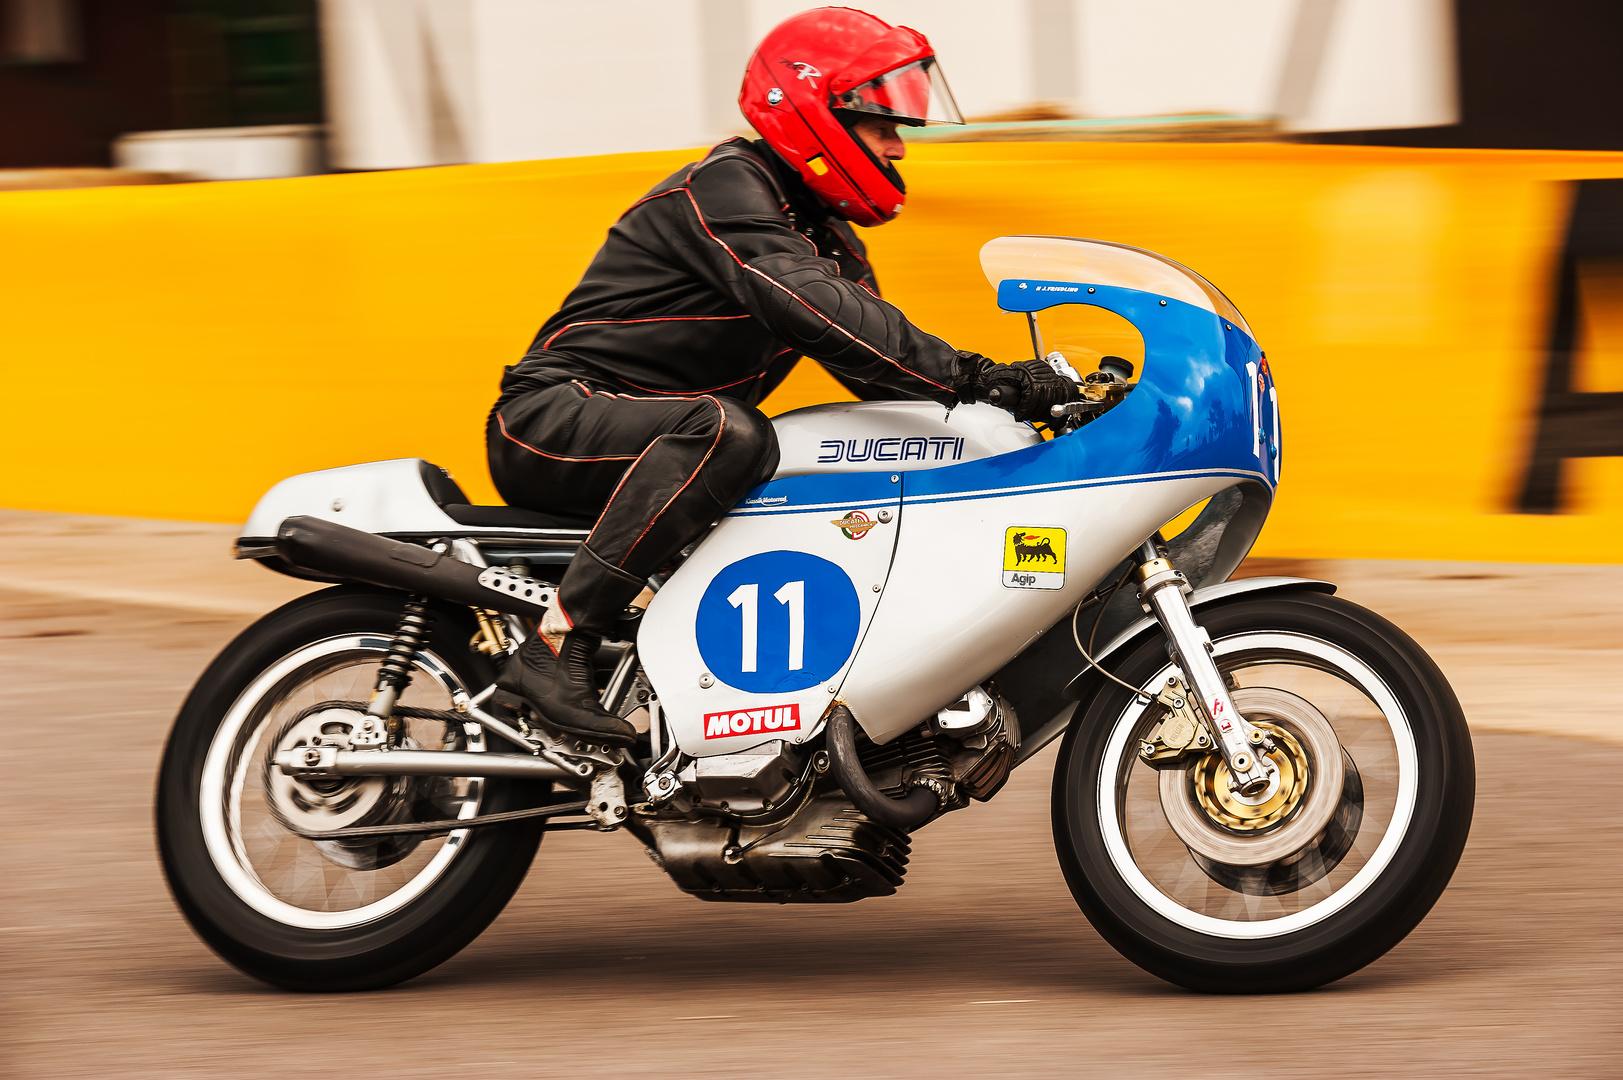 Klassiker von Ducati